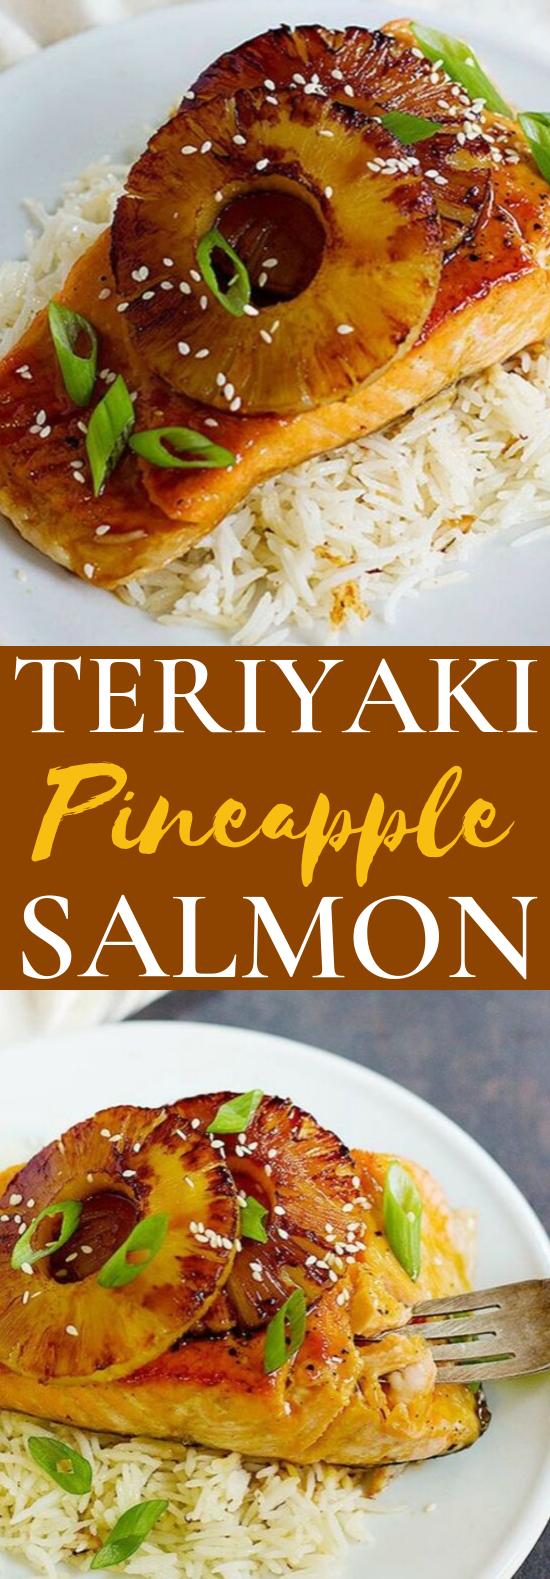 Teriyaki Pineapple Salmon #dinner #seafood